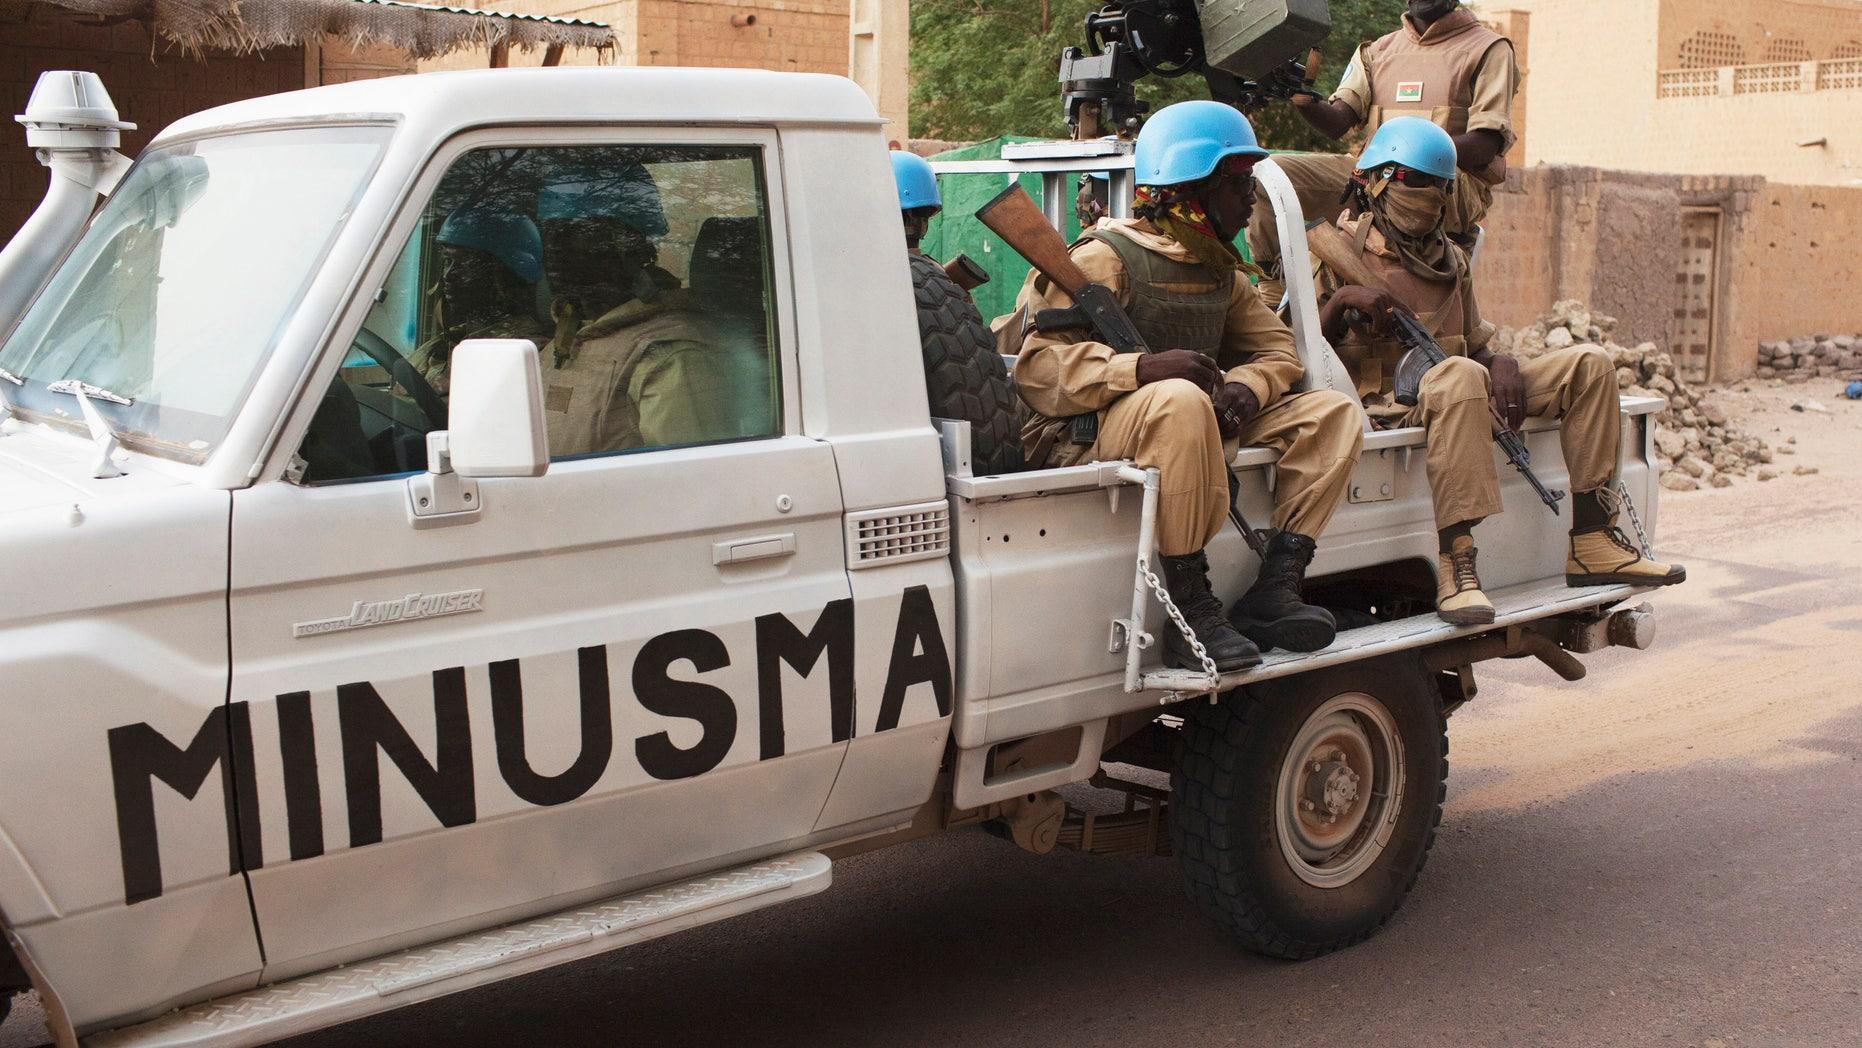 July 28, 2013 - FILE photo of UN peacekeepers from a Burkina Faso patrol in Timbuktu, Mali.